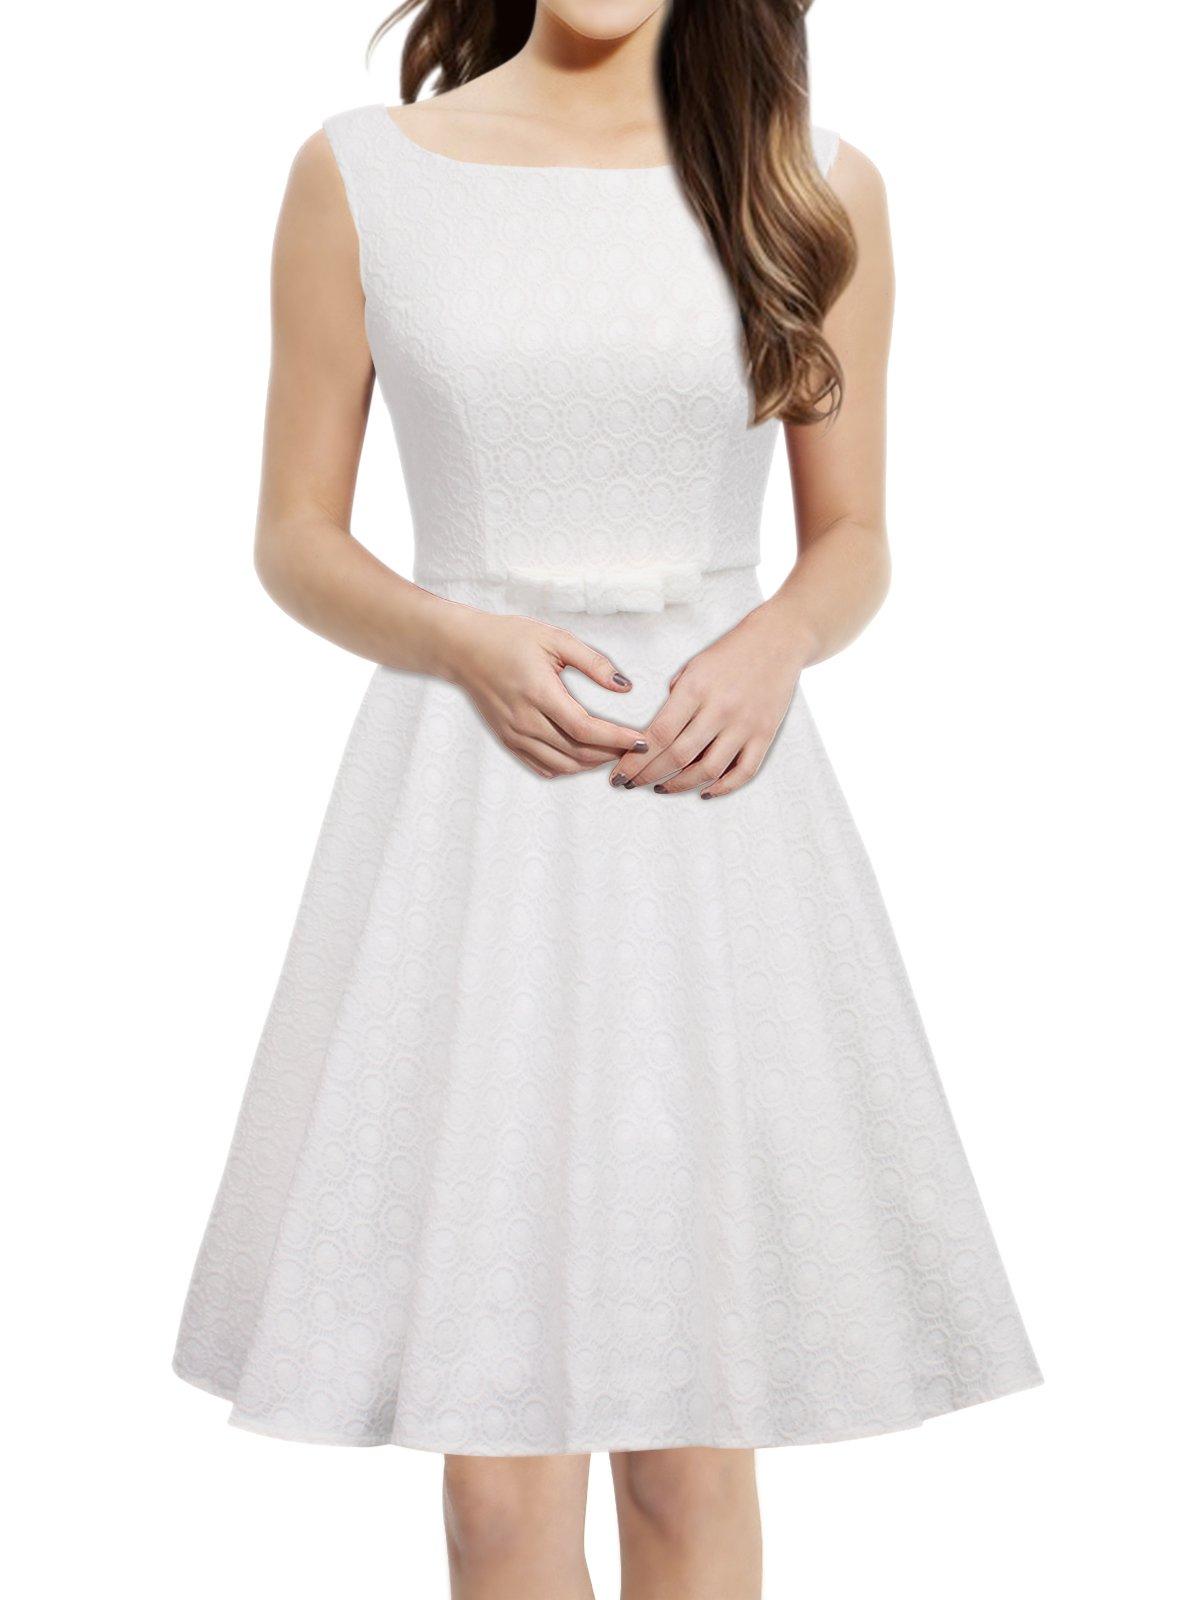 iLover Classic Vintage Audrey Hepburn Style 1950's Rockabilly Large Hem Evening Dress (White, XX-Large)